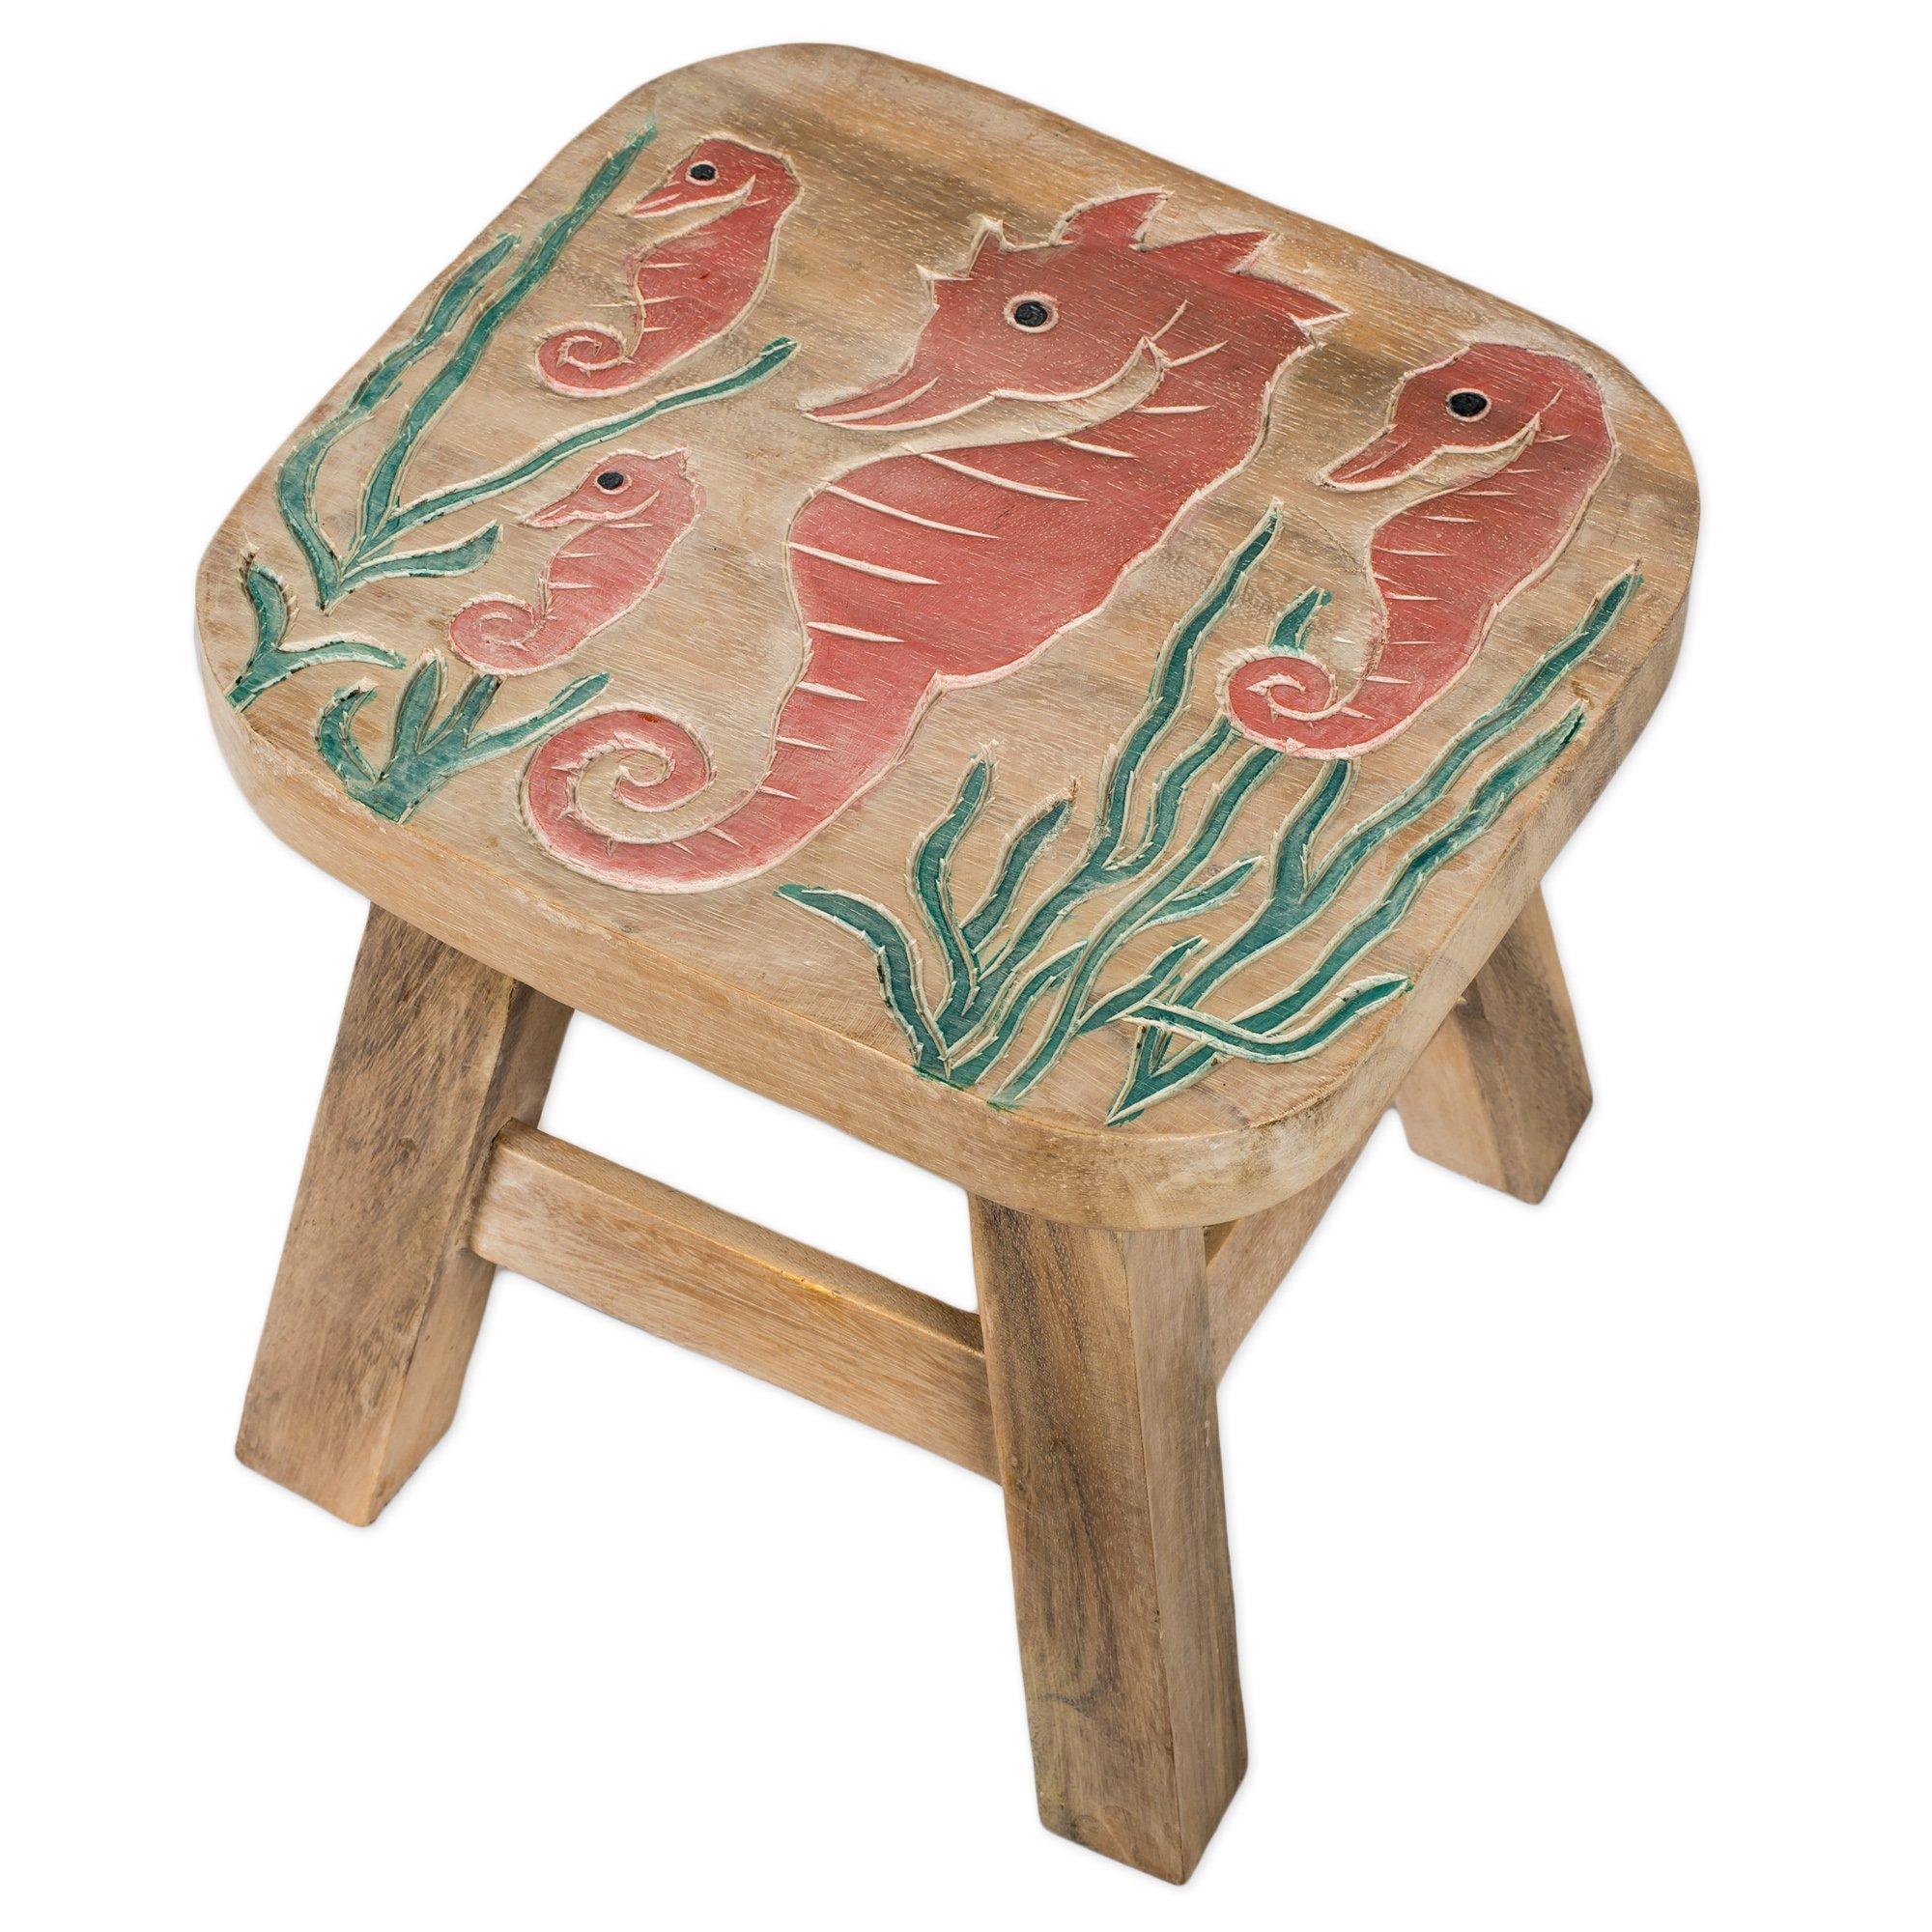 Seahorse Design Hand Carved Acacia Hardwood Decorative Short Stool